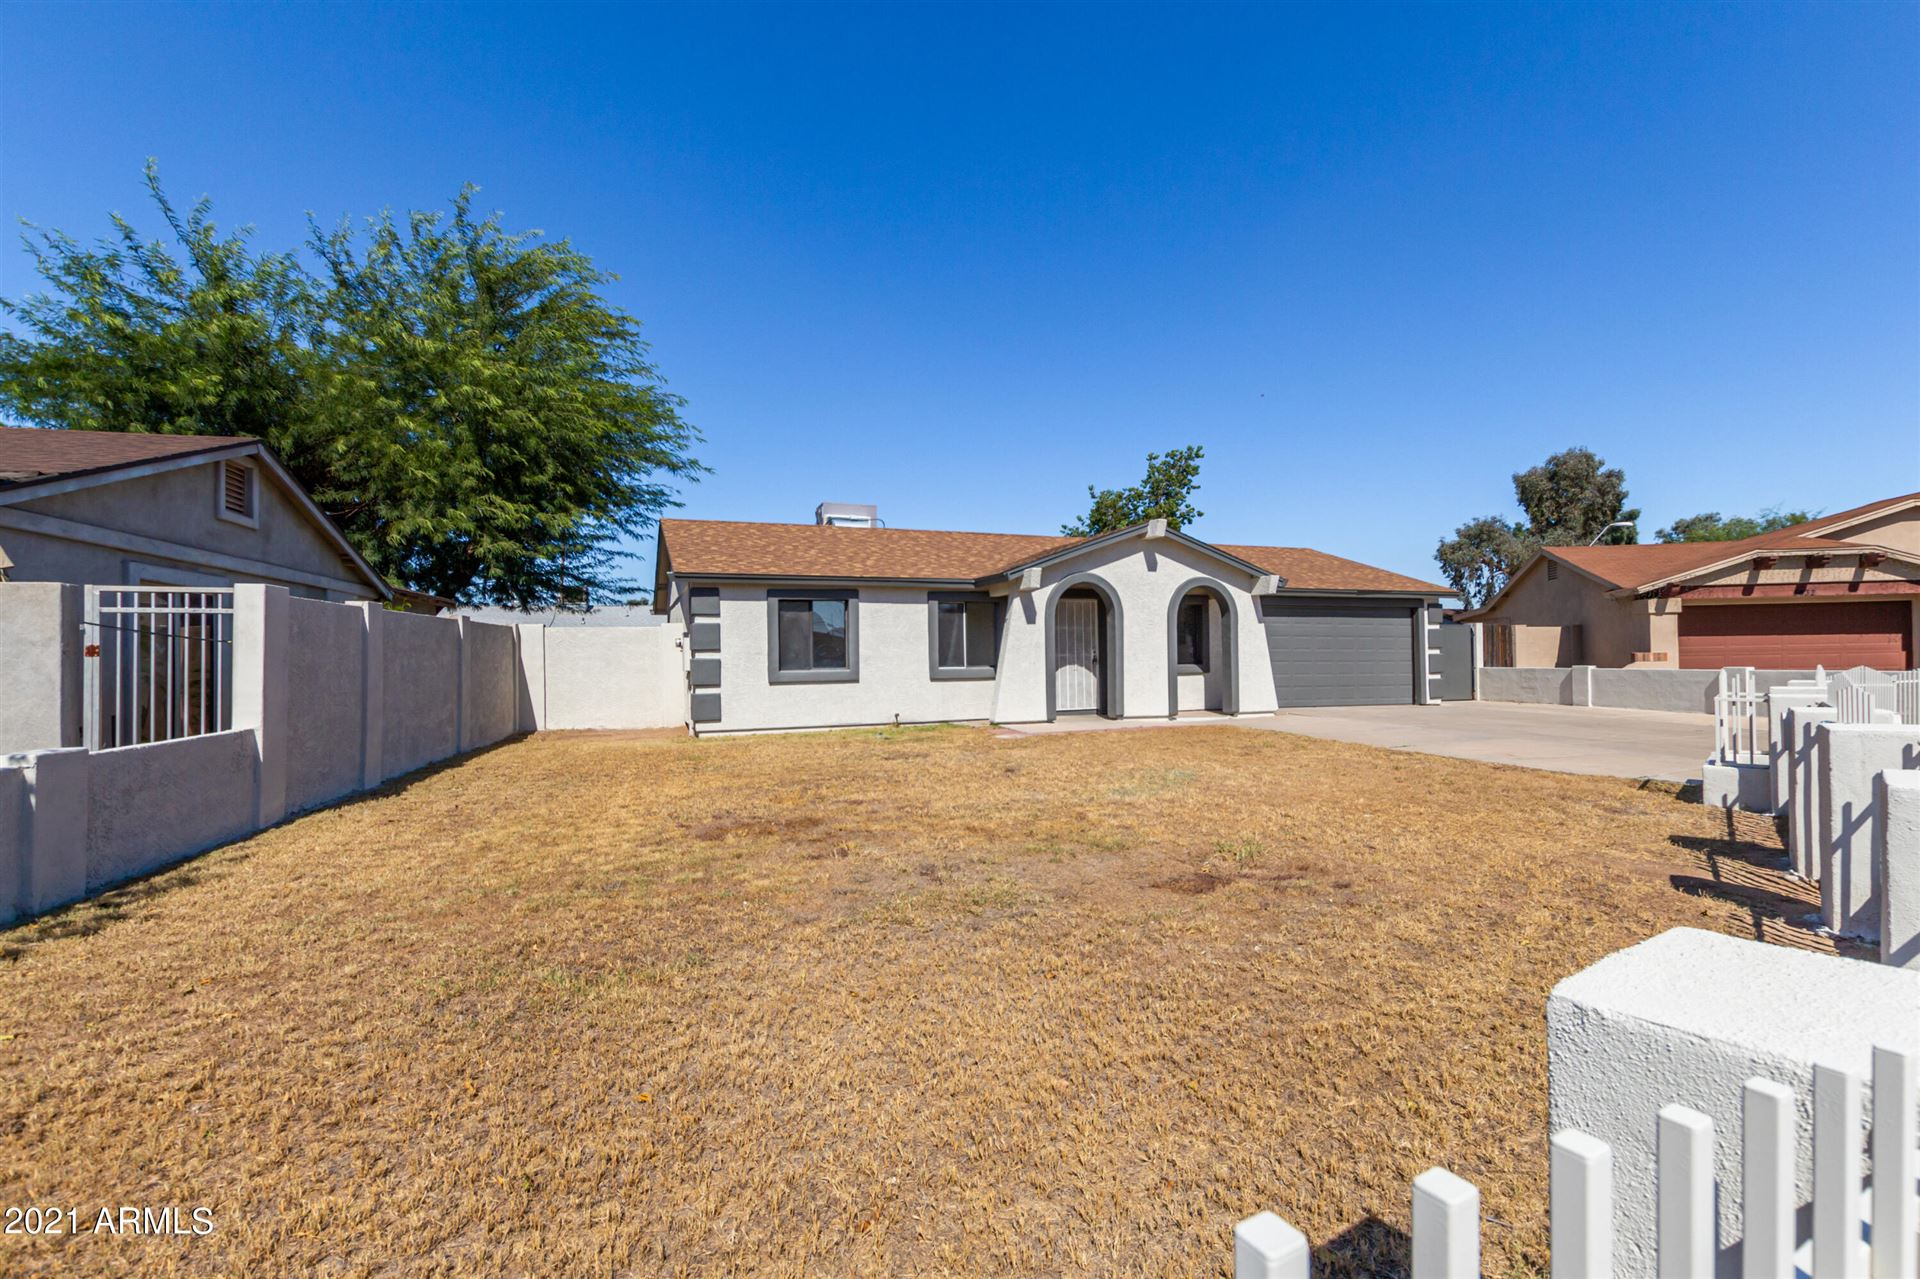 Photo of 6936 W MERRELL Street, Phoenix, AZ 85033 (MLS # 6307841)